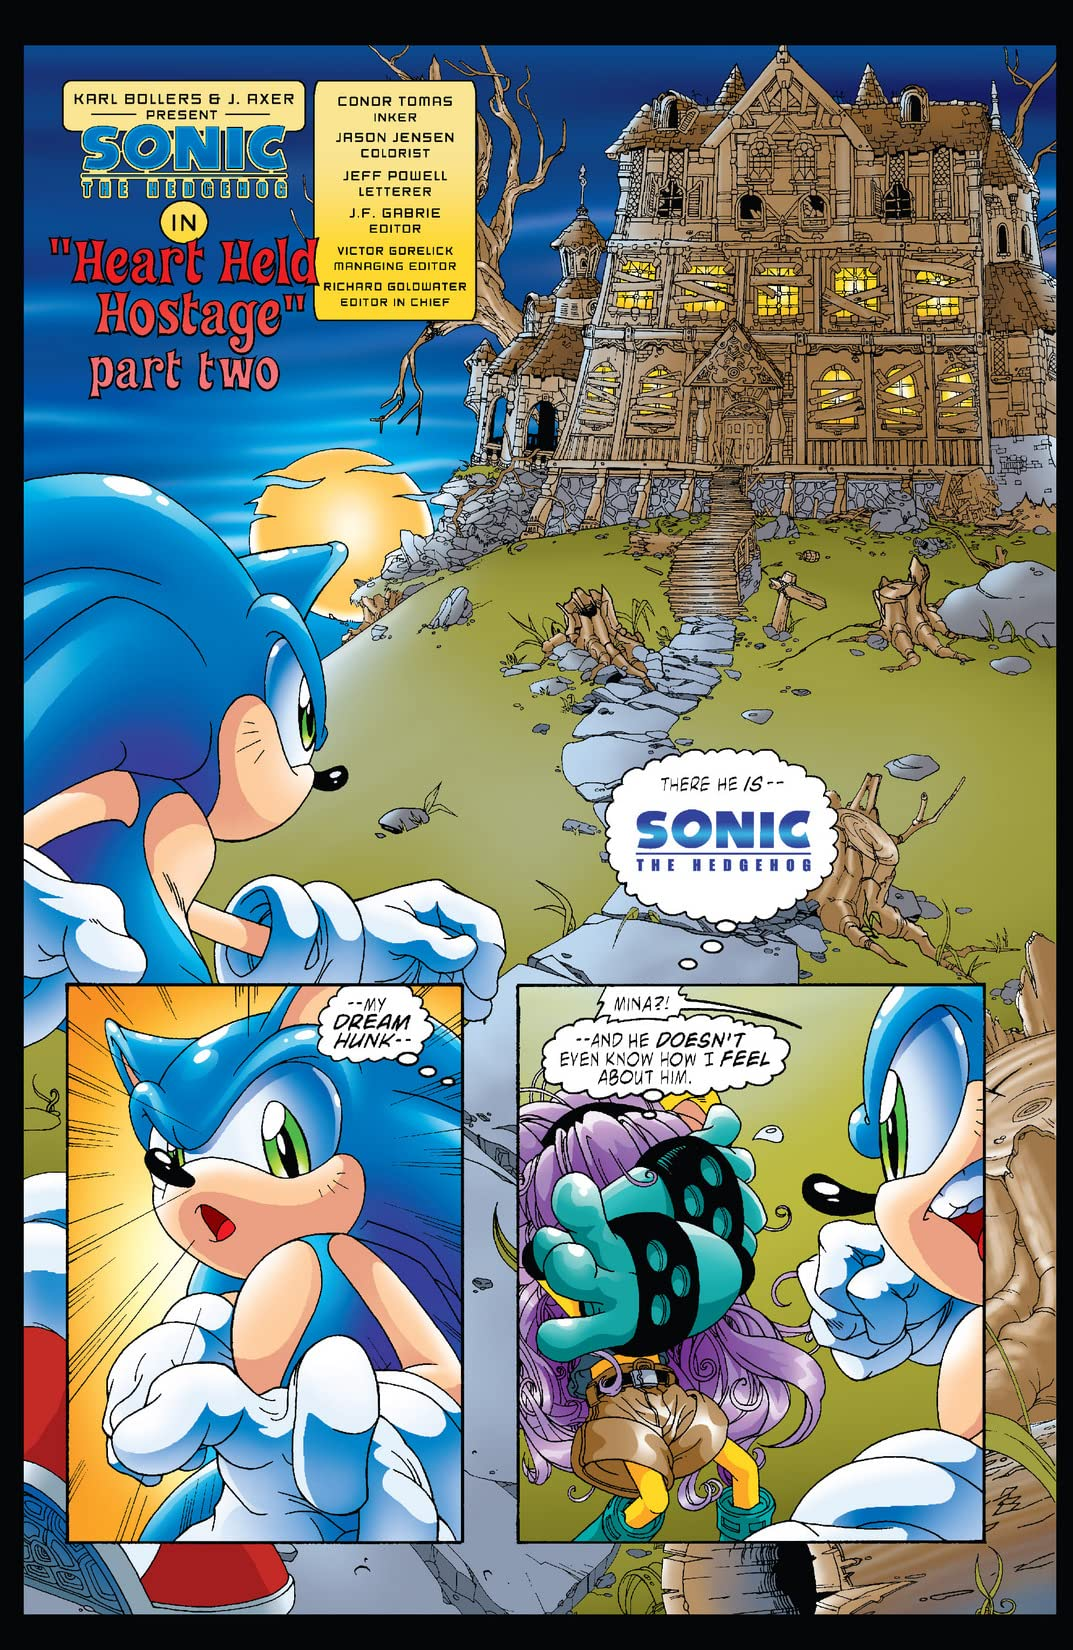 Sonic the Hedgehog #123